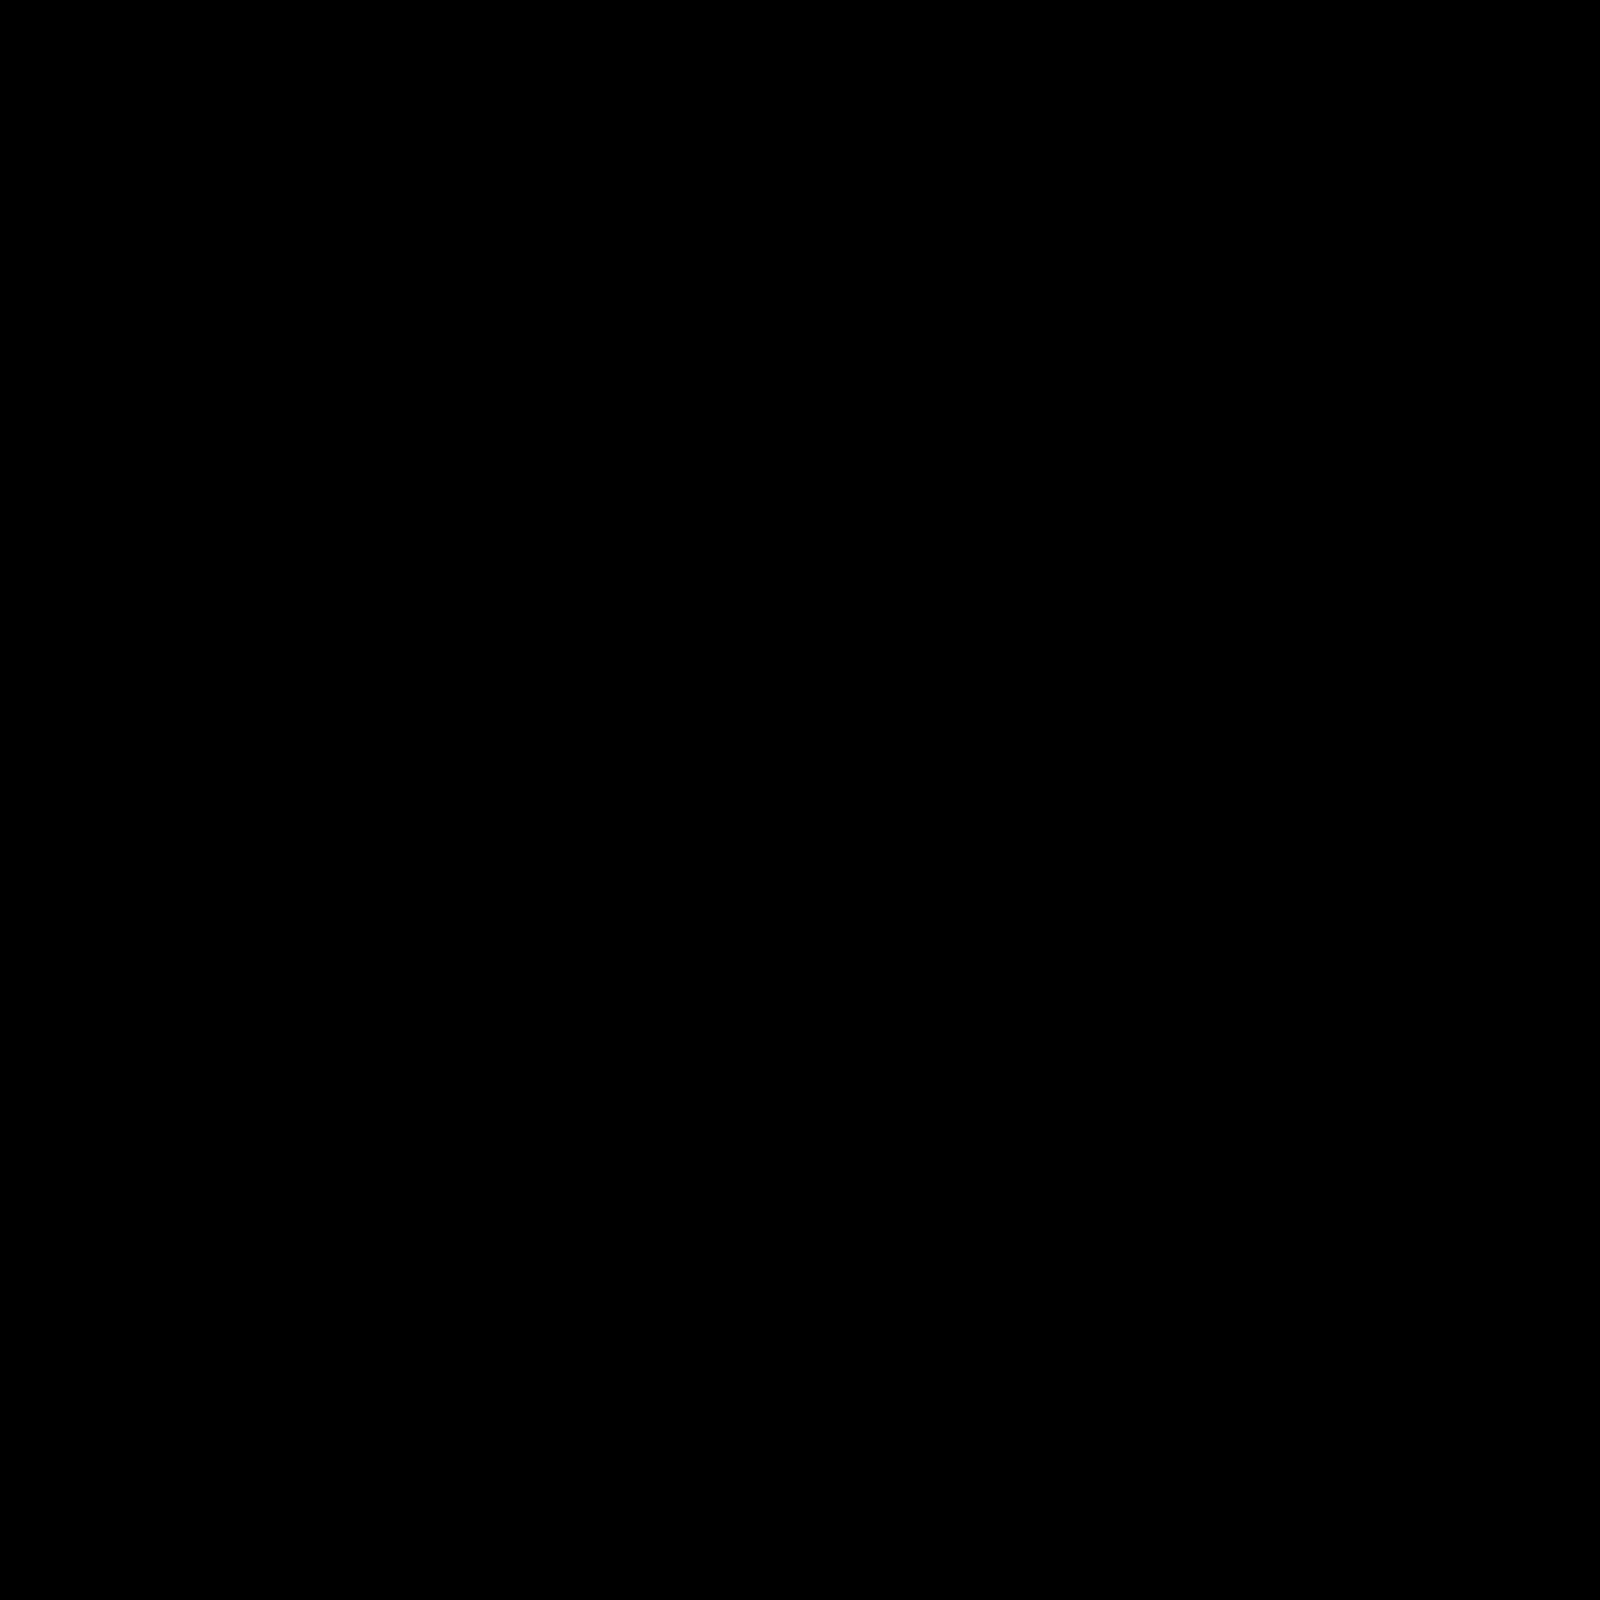 1600x1600 Darth Vader Clipart Vector